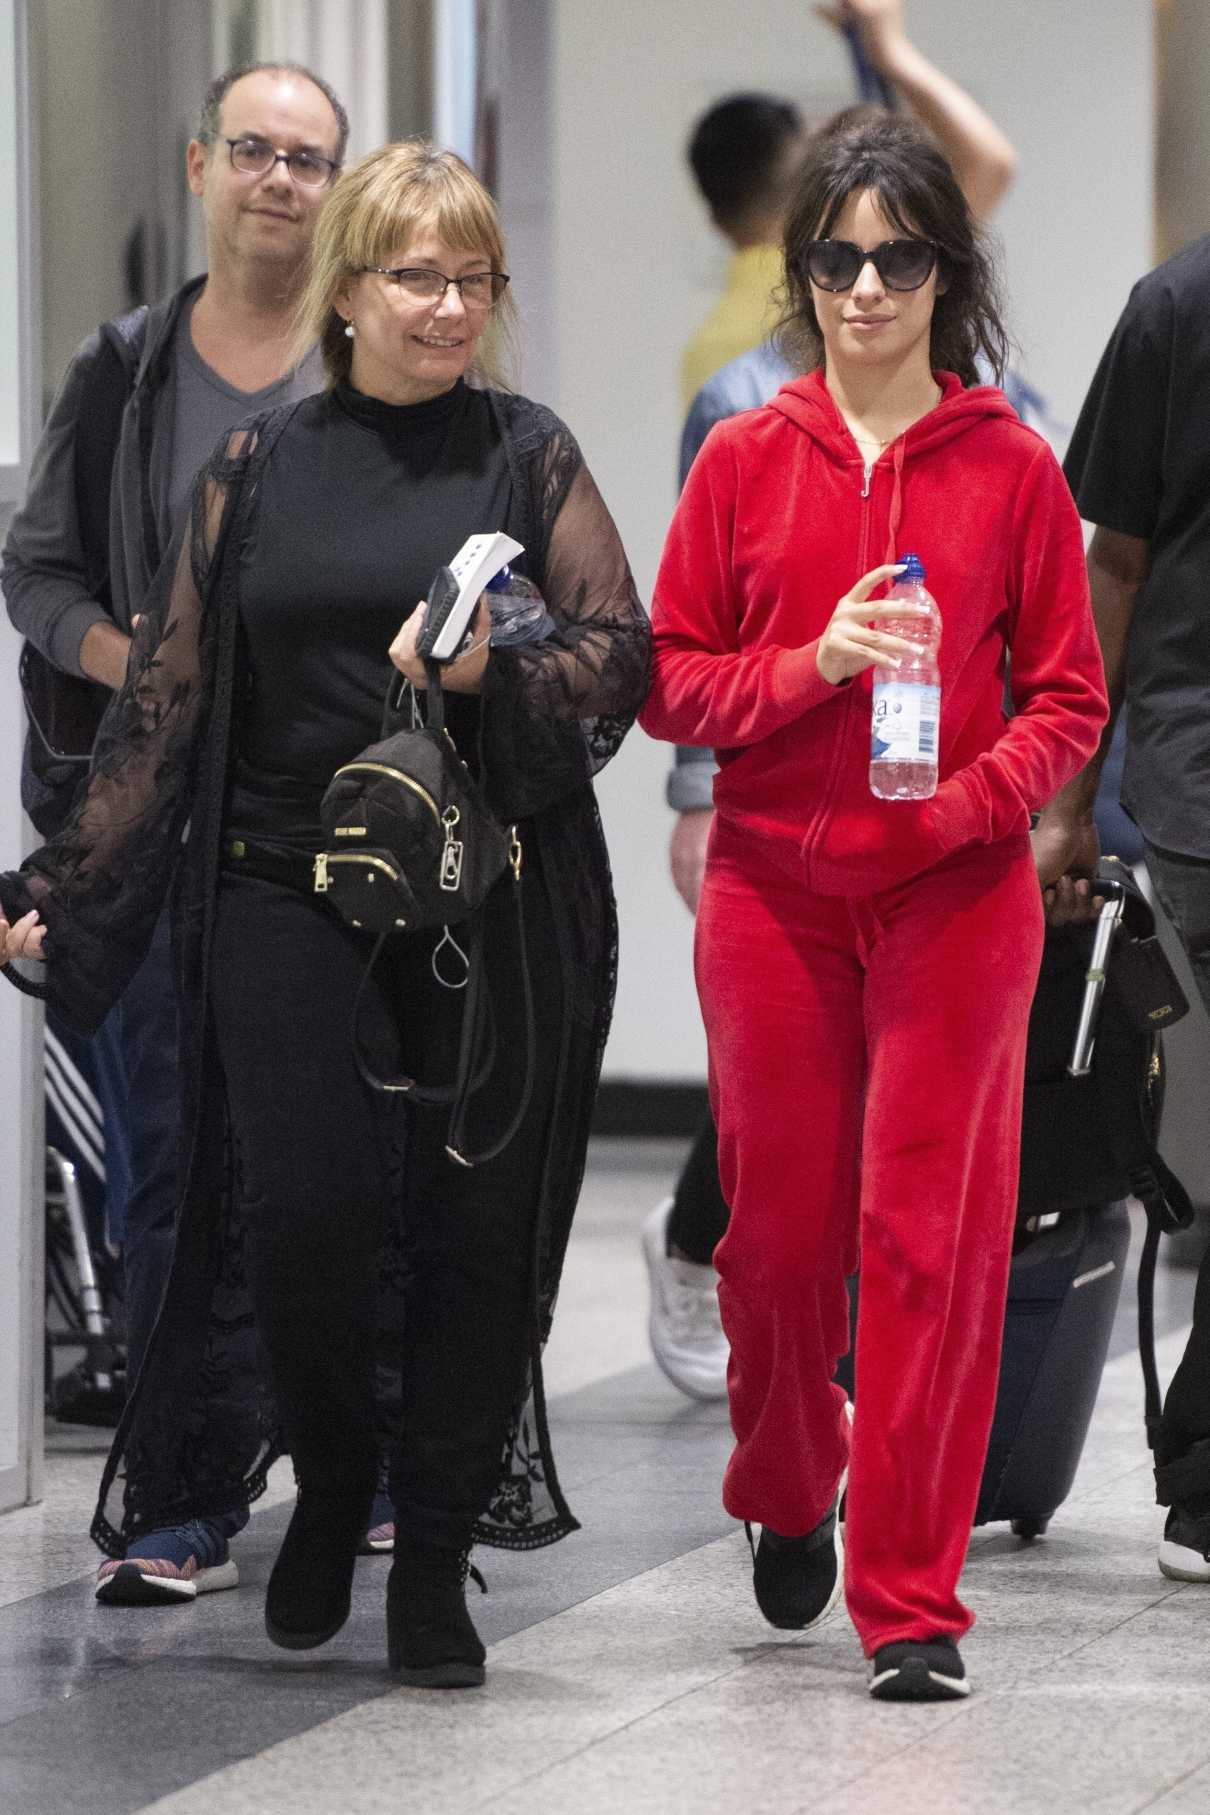 Camila Cabello in a Red Jogging Suit